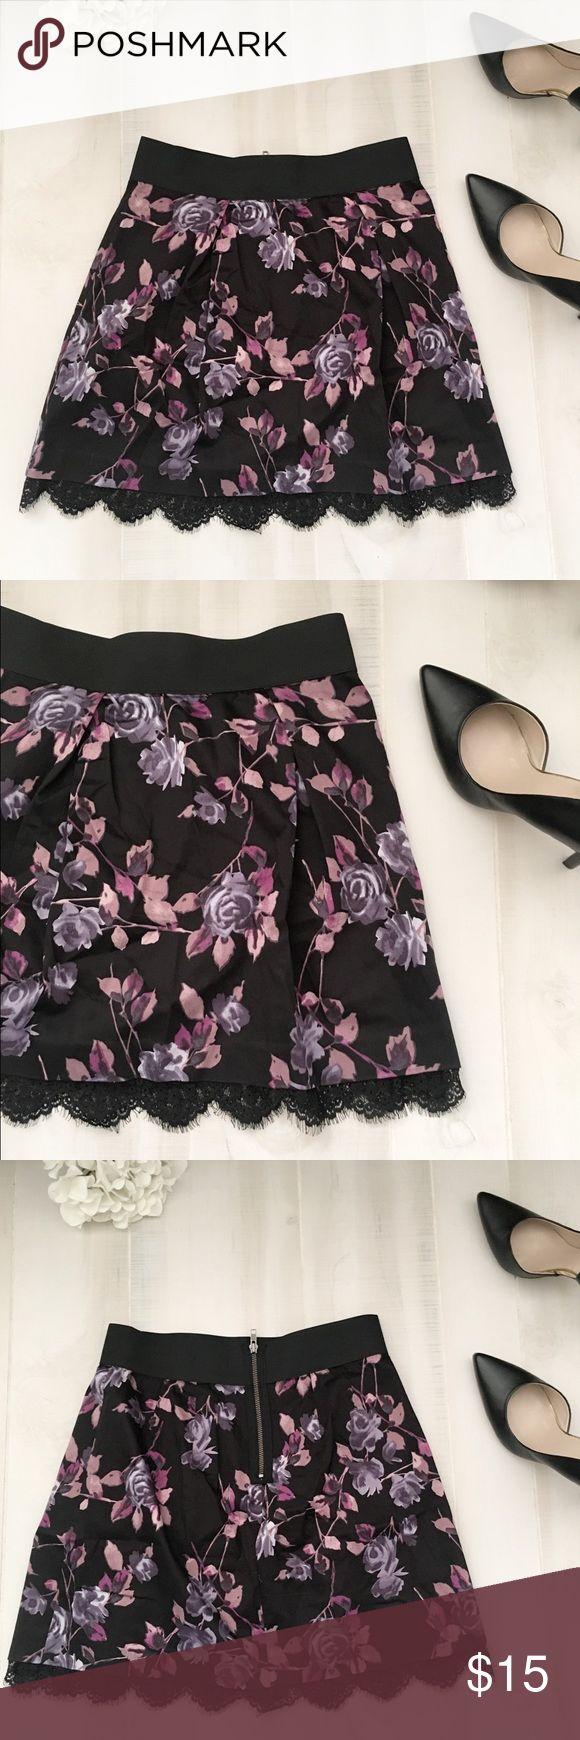 "Elle Cute floral lace hem skirt EUC Elle floral print skirt. Black base with pink, mauve, and purple multicolored flowers. Elastic stretch waist. Laced peek hem. Back zip. Size m. Waist 15"", waist to hem 18.5 Elle Skirts Mini"